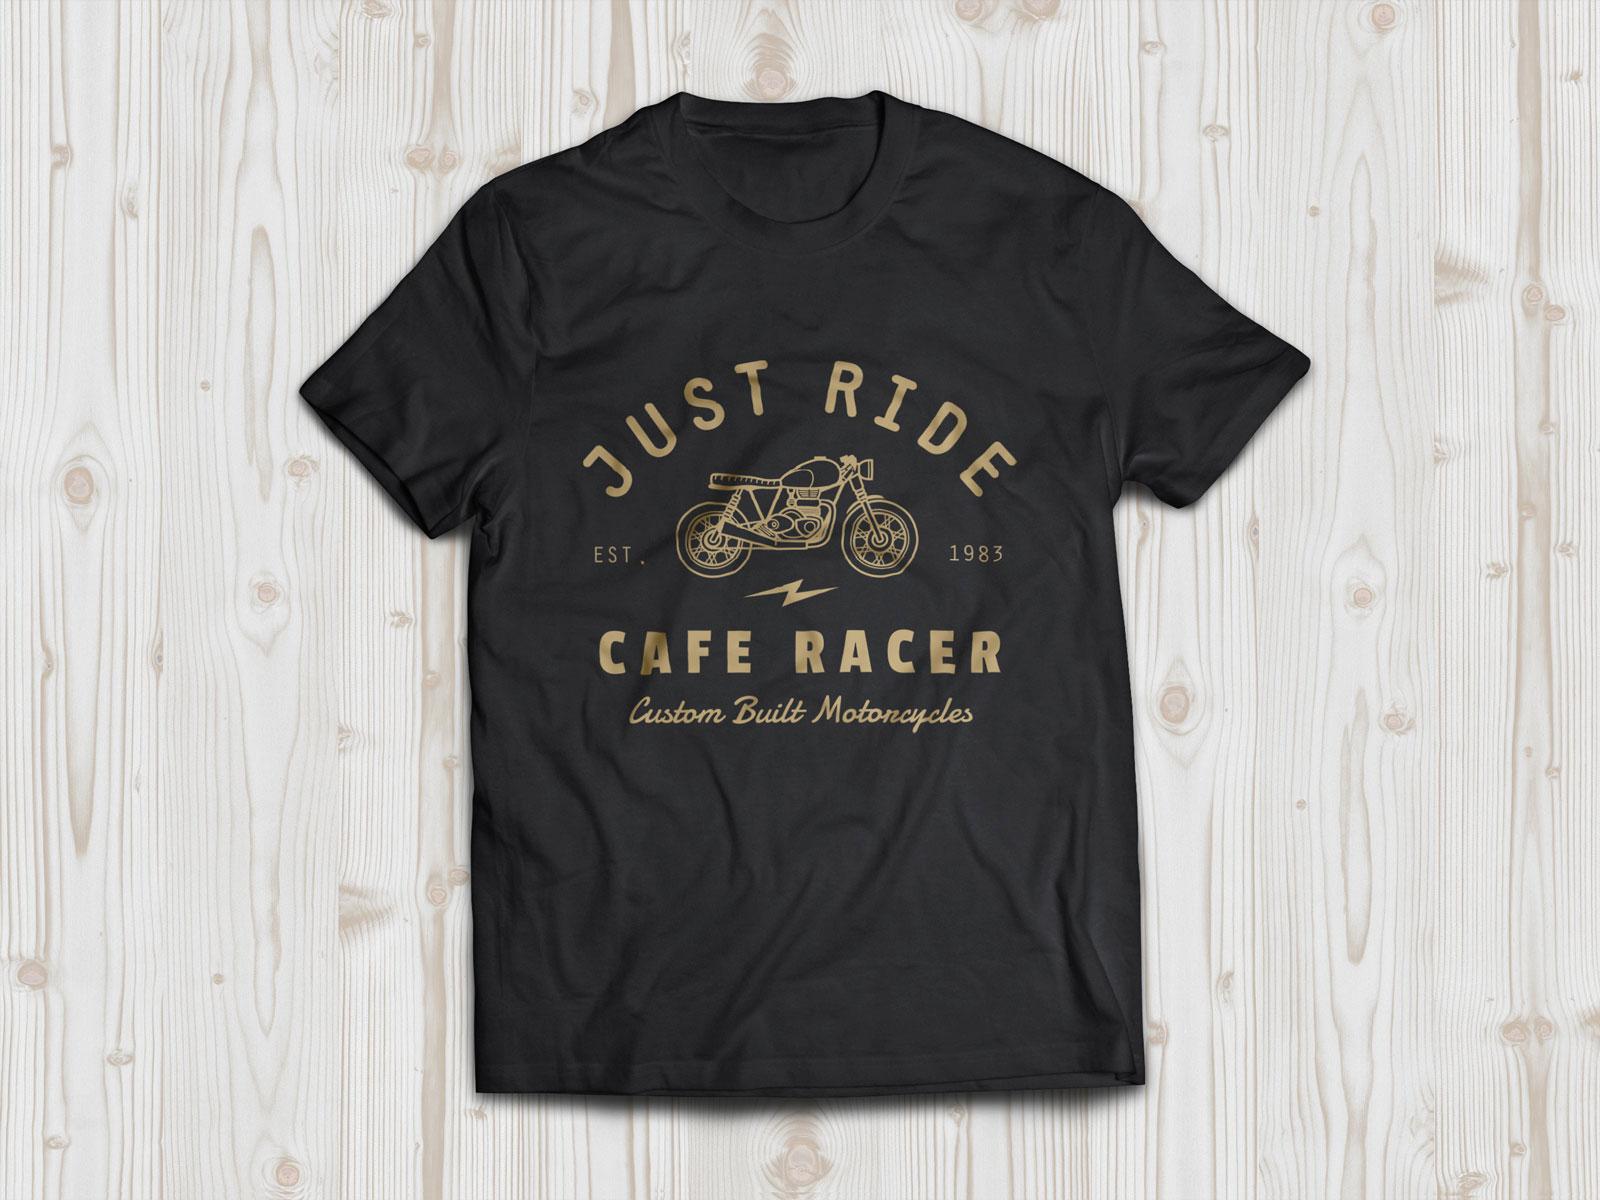 Black t shirt template - Black T Shirt Template Psd Black Half Sleeves T Shirt Mockup Psd Download